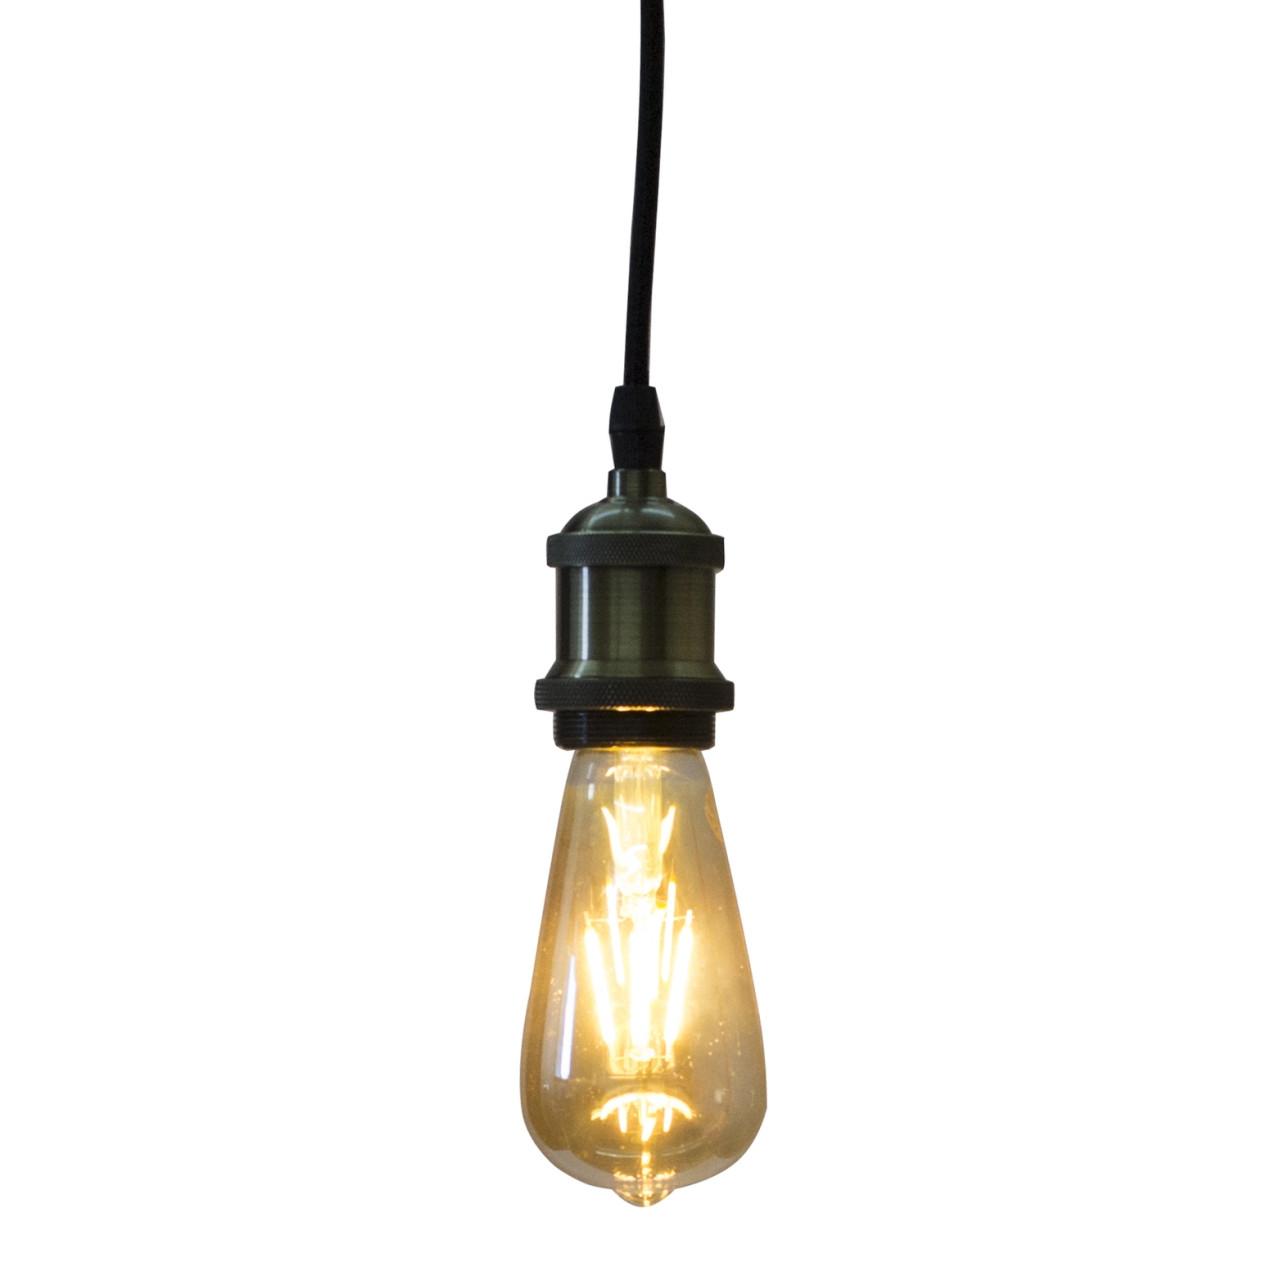 Светодиодная ретро лампа Filament 6w E27 Rustic Vintage-6 Horoz Electric